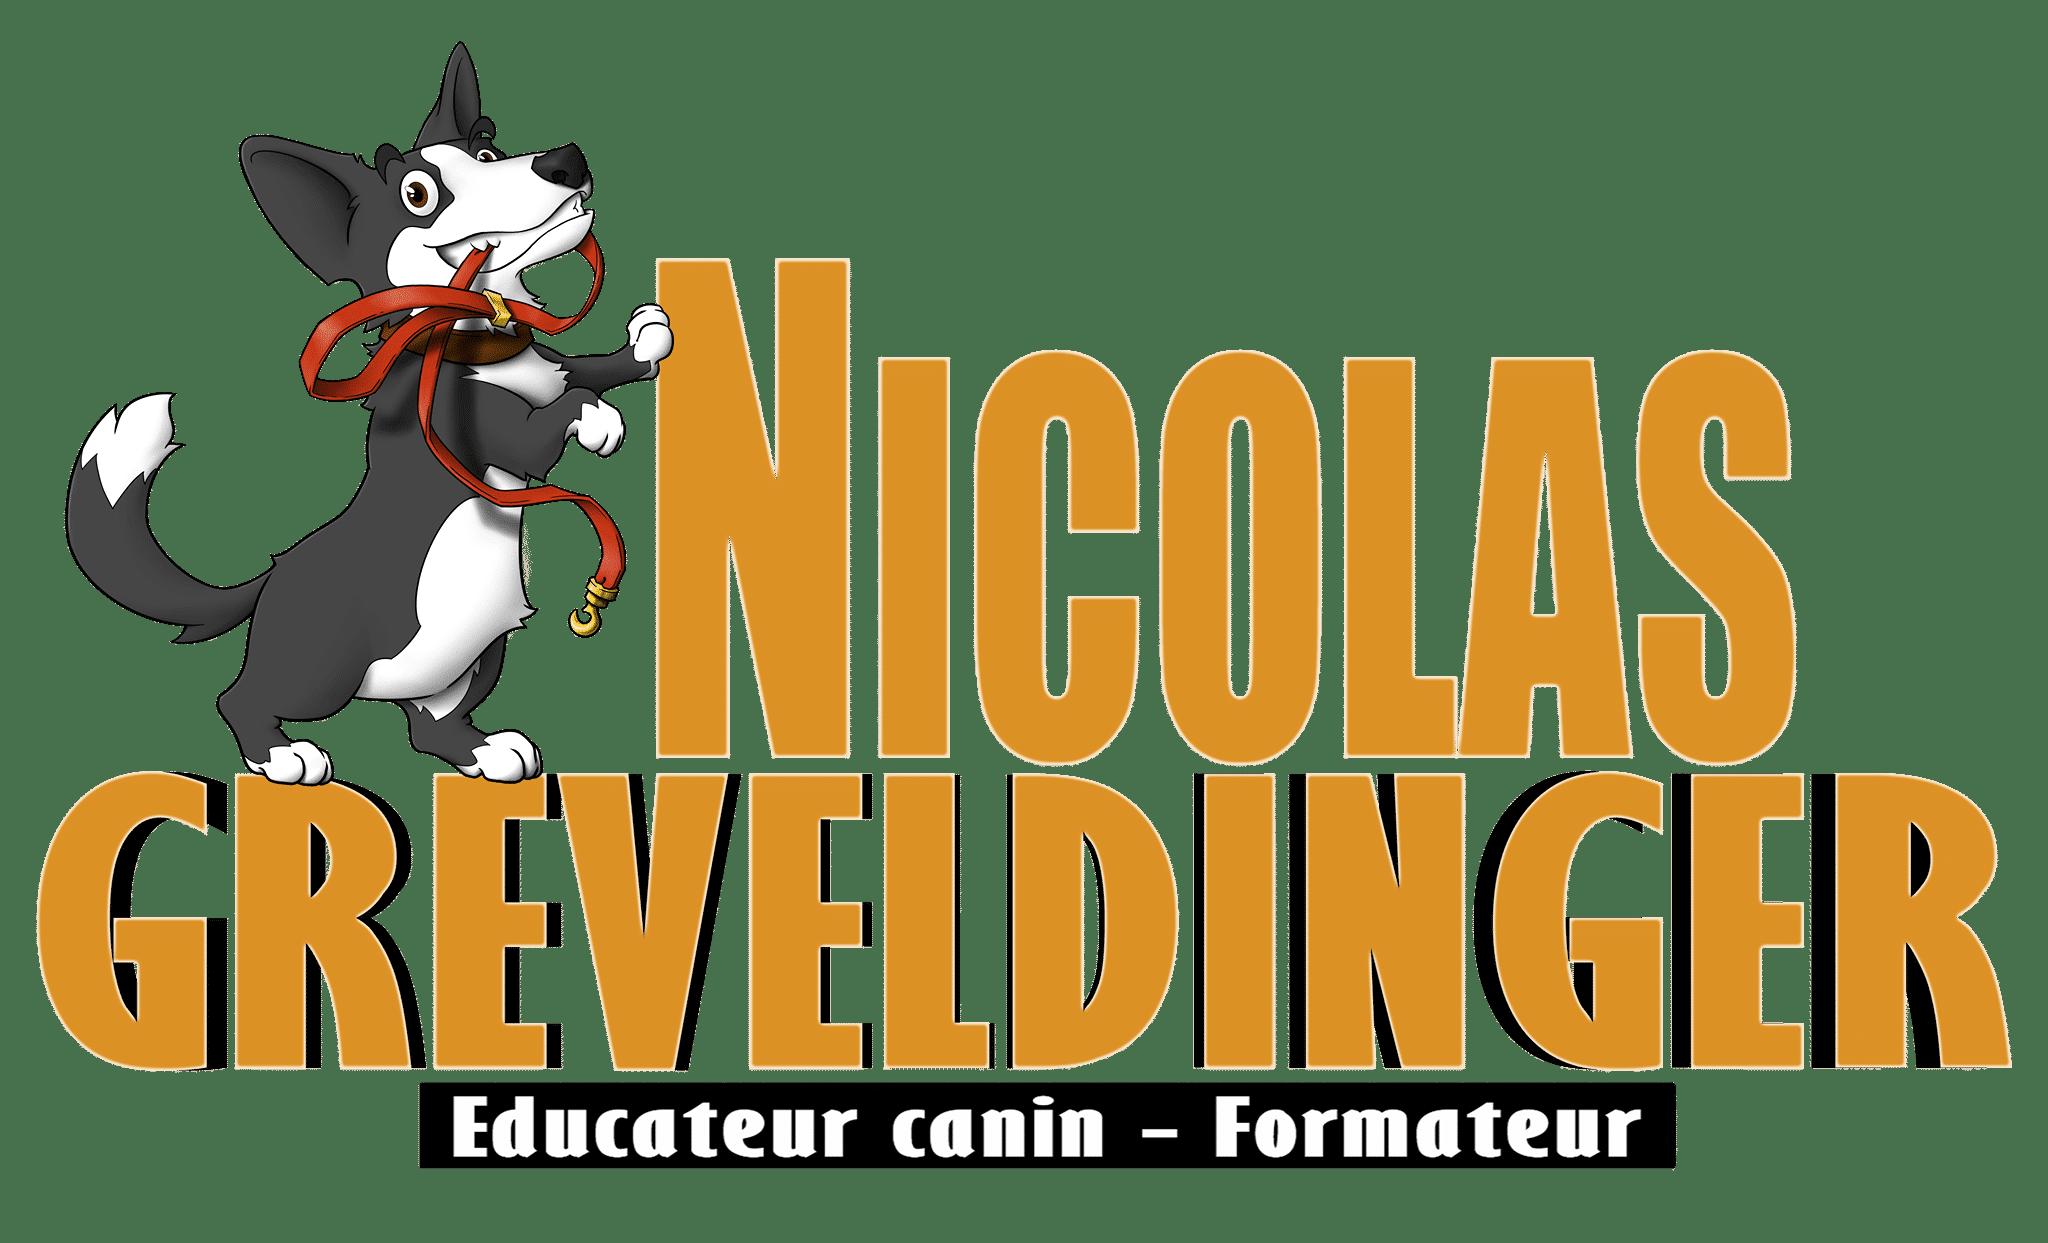 Nicolas Greveldinger